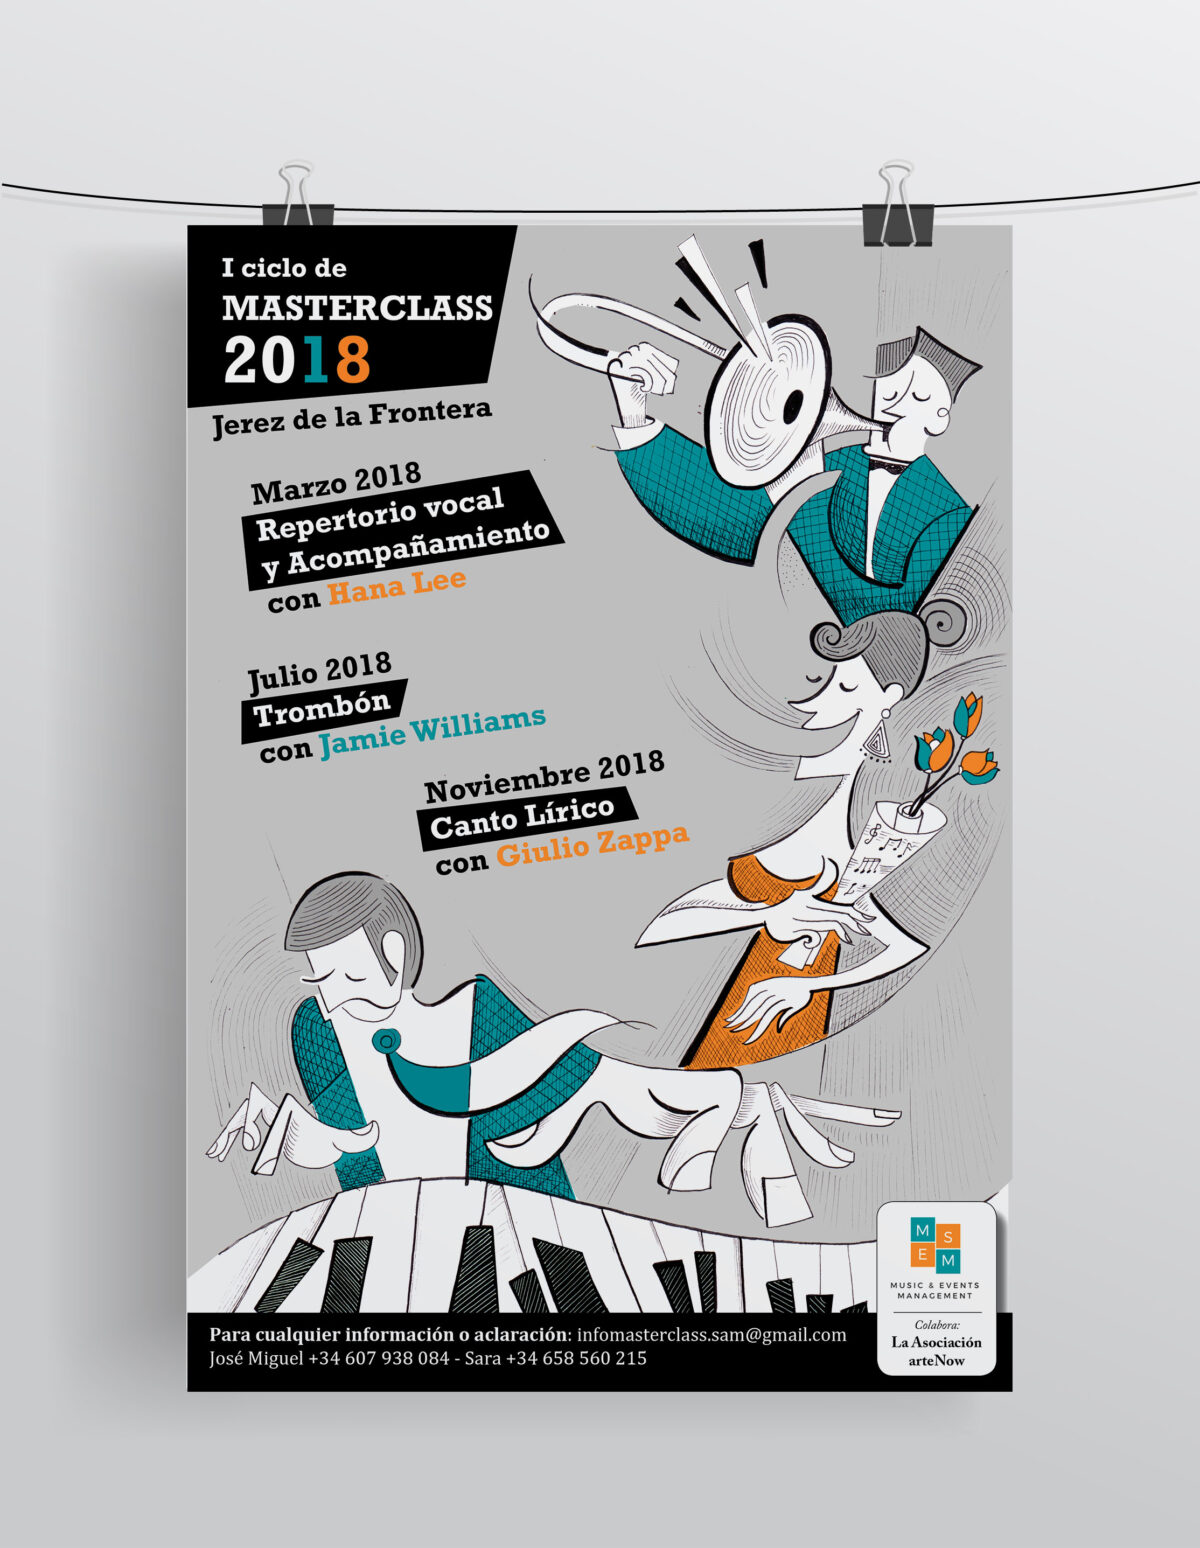 Masterclass Jerez de la Frontera - Locandina 2018